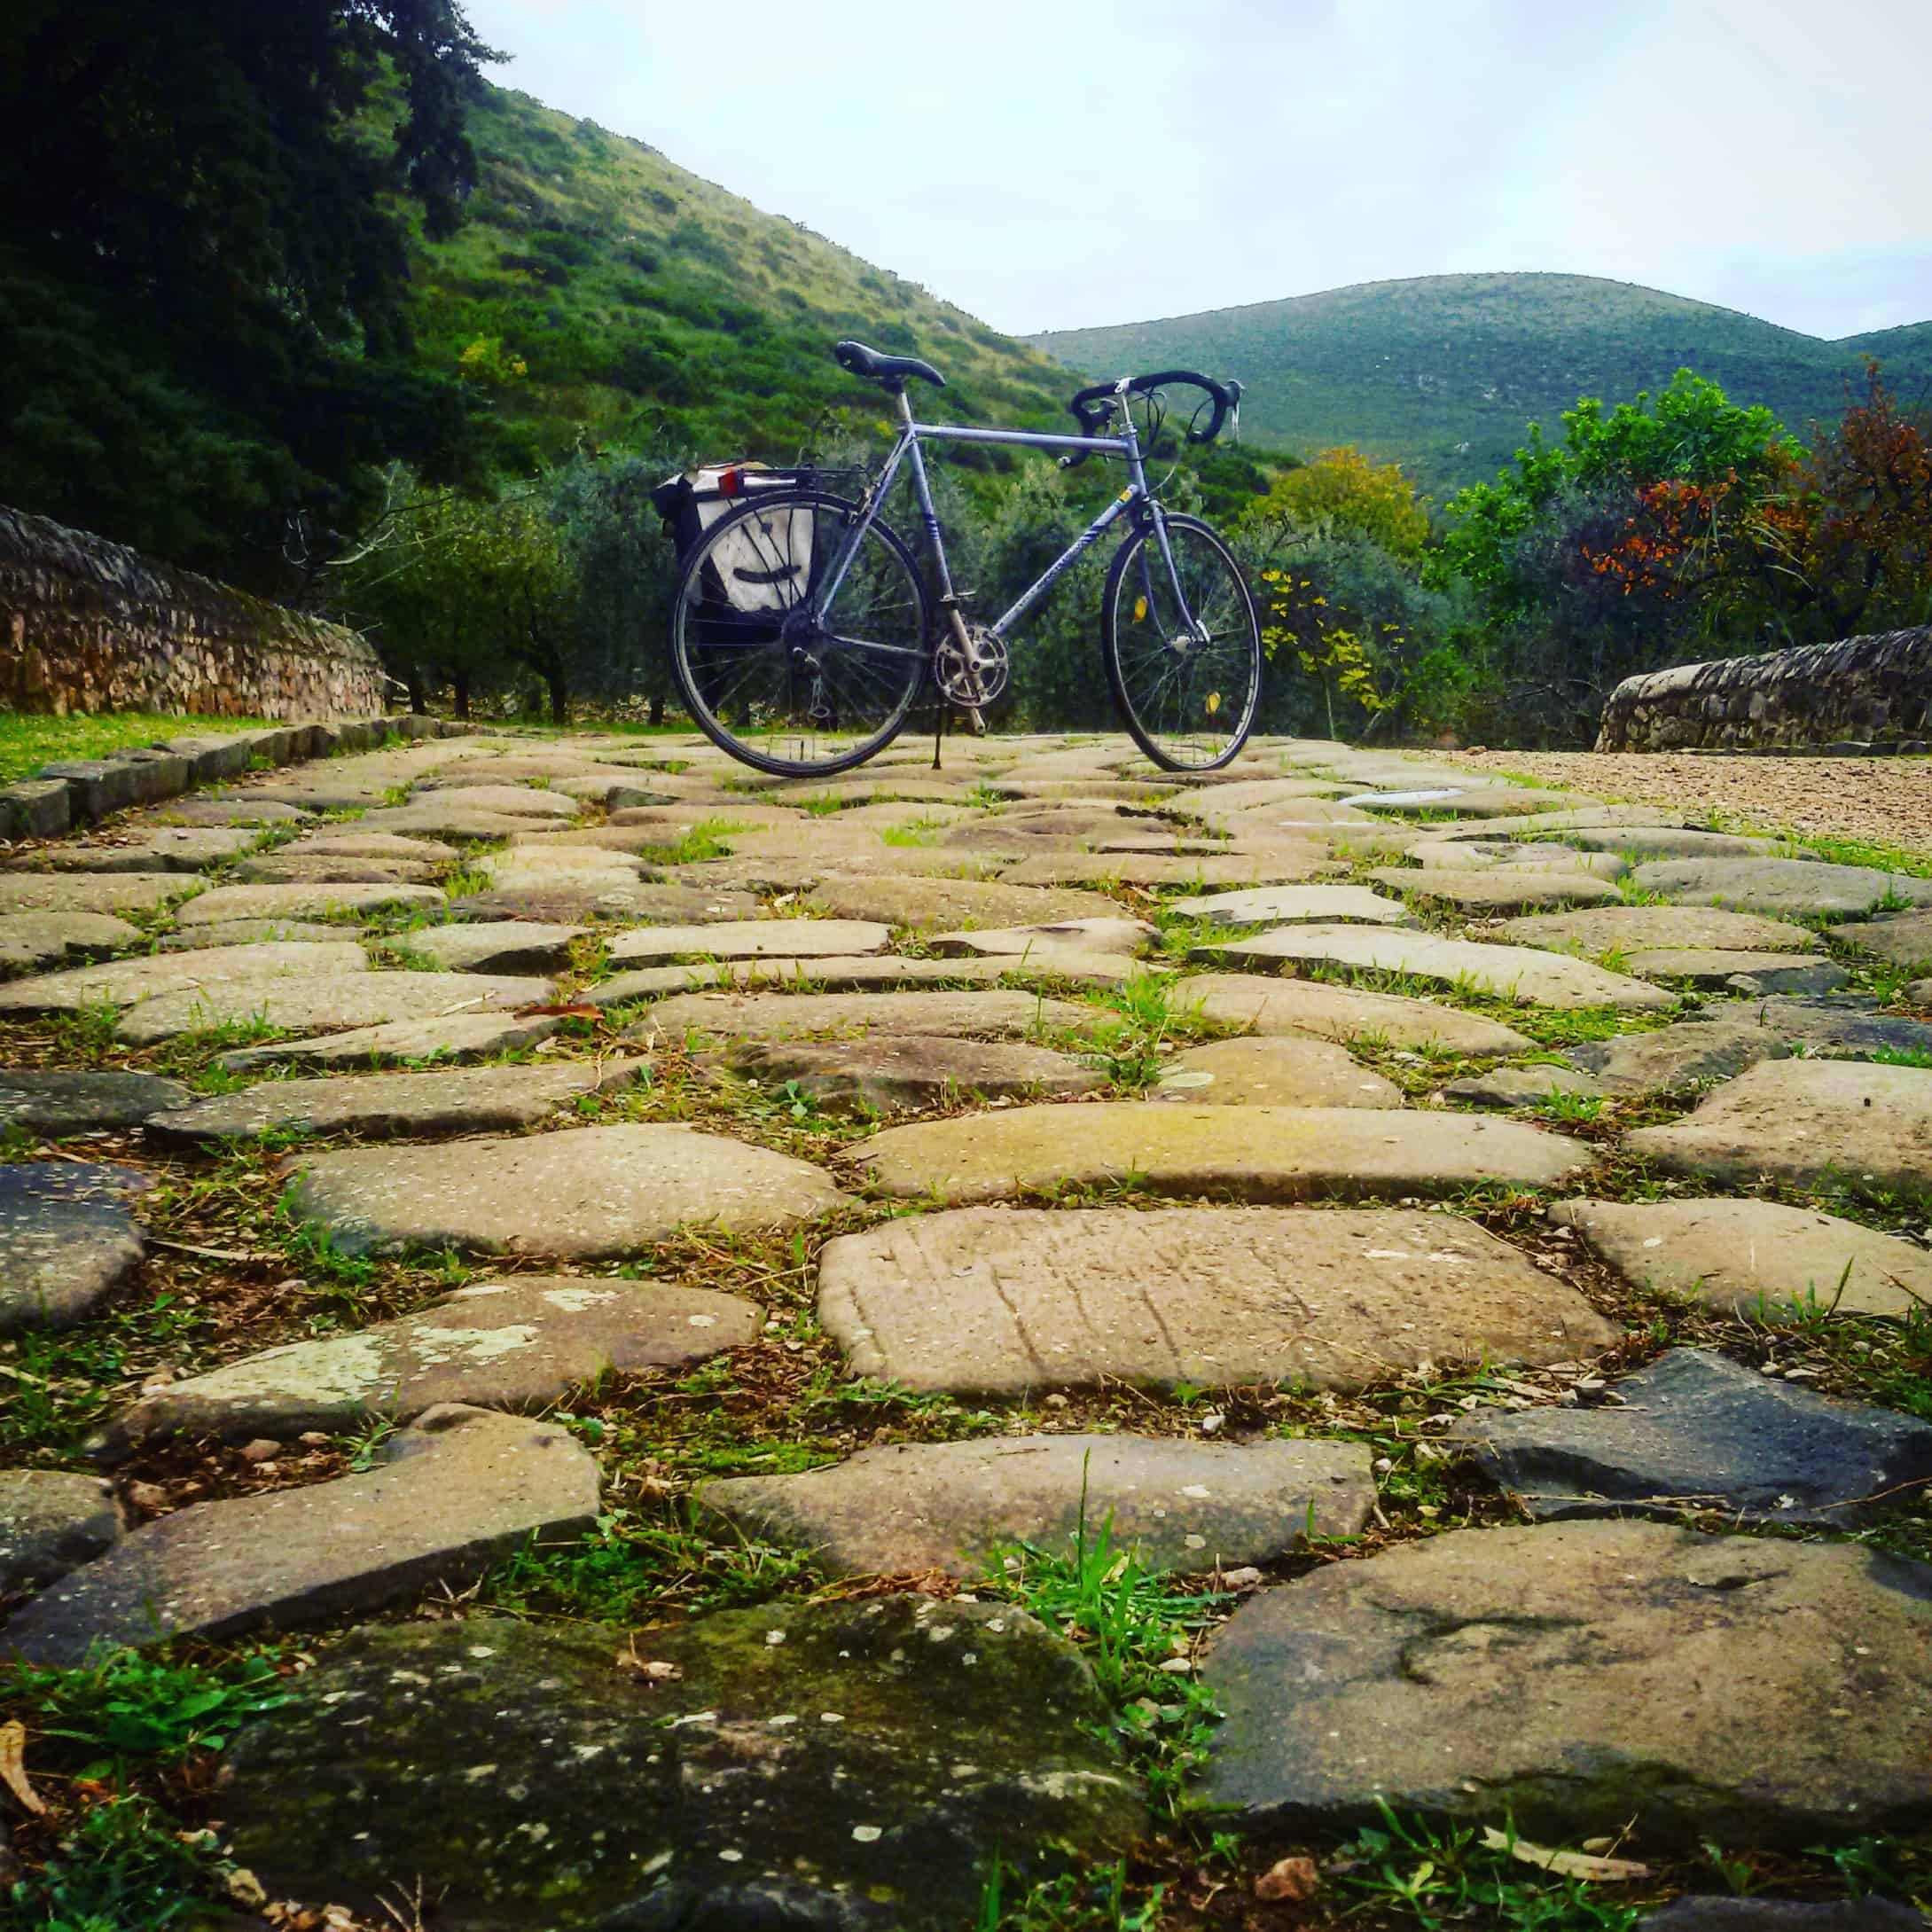 Da Roma a Brindisi in bicicletta lungo l'Appia Antica.